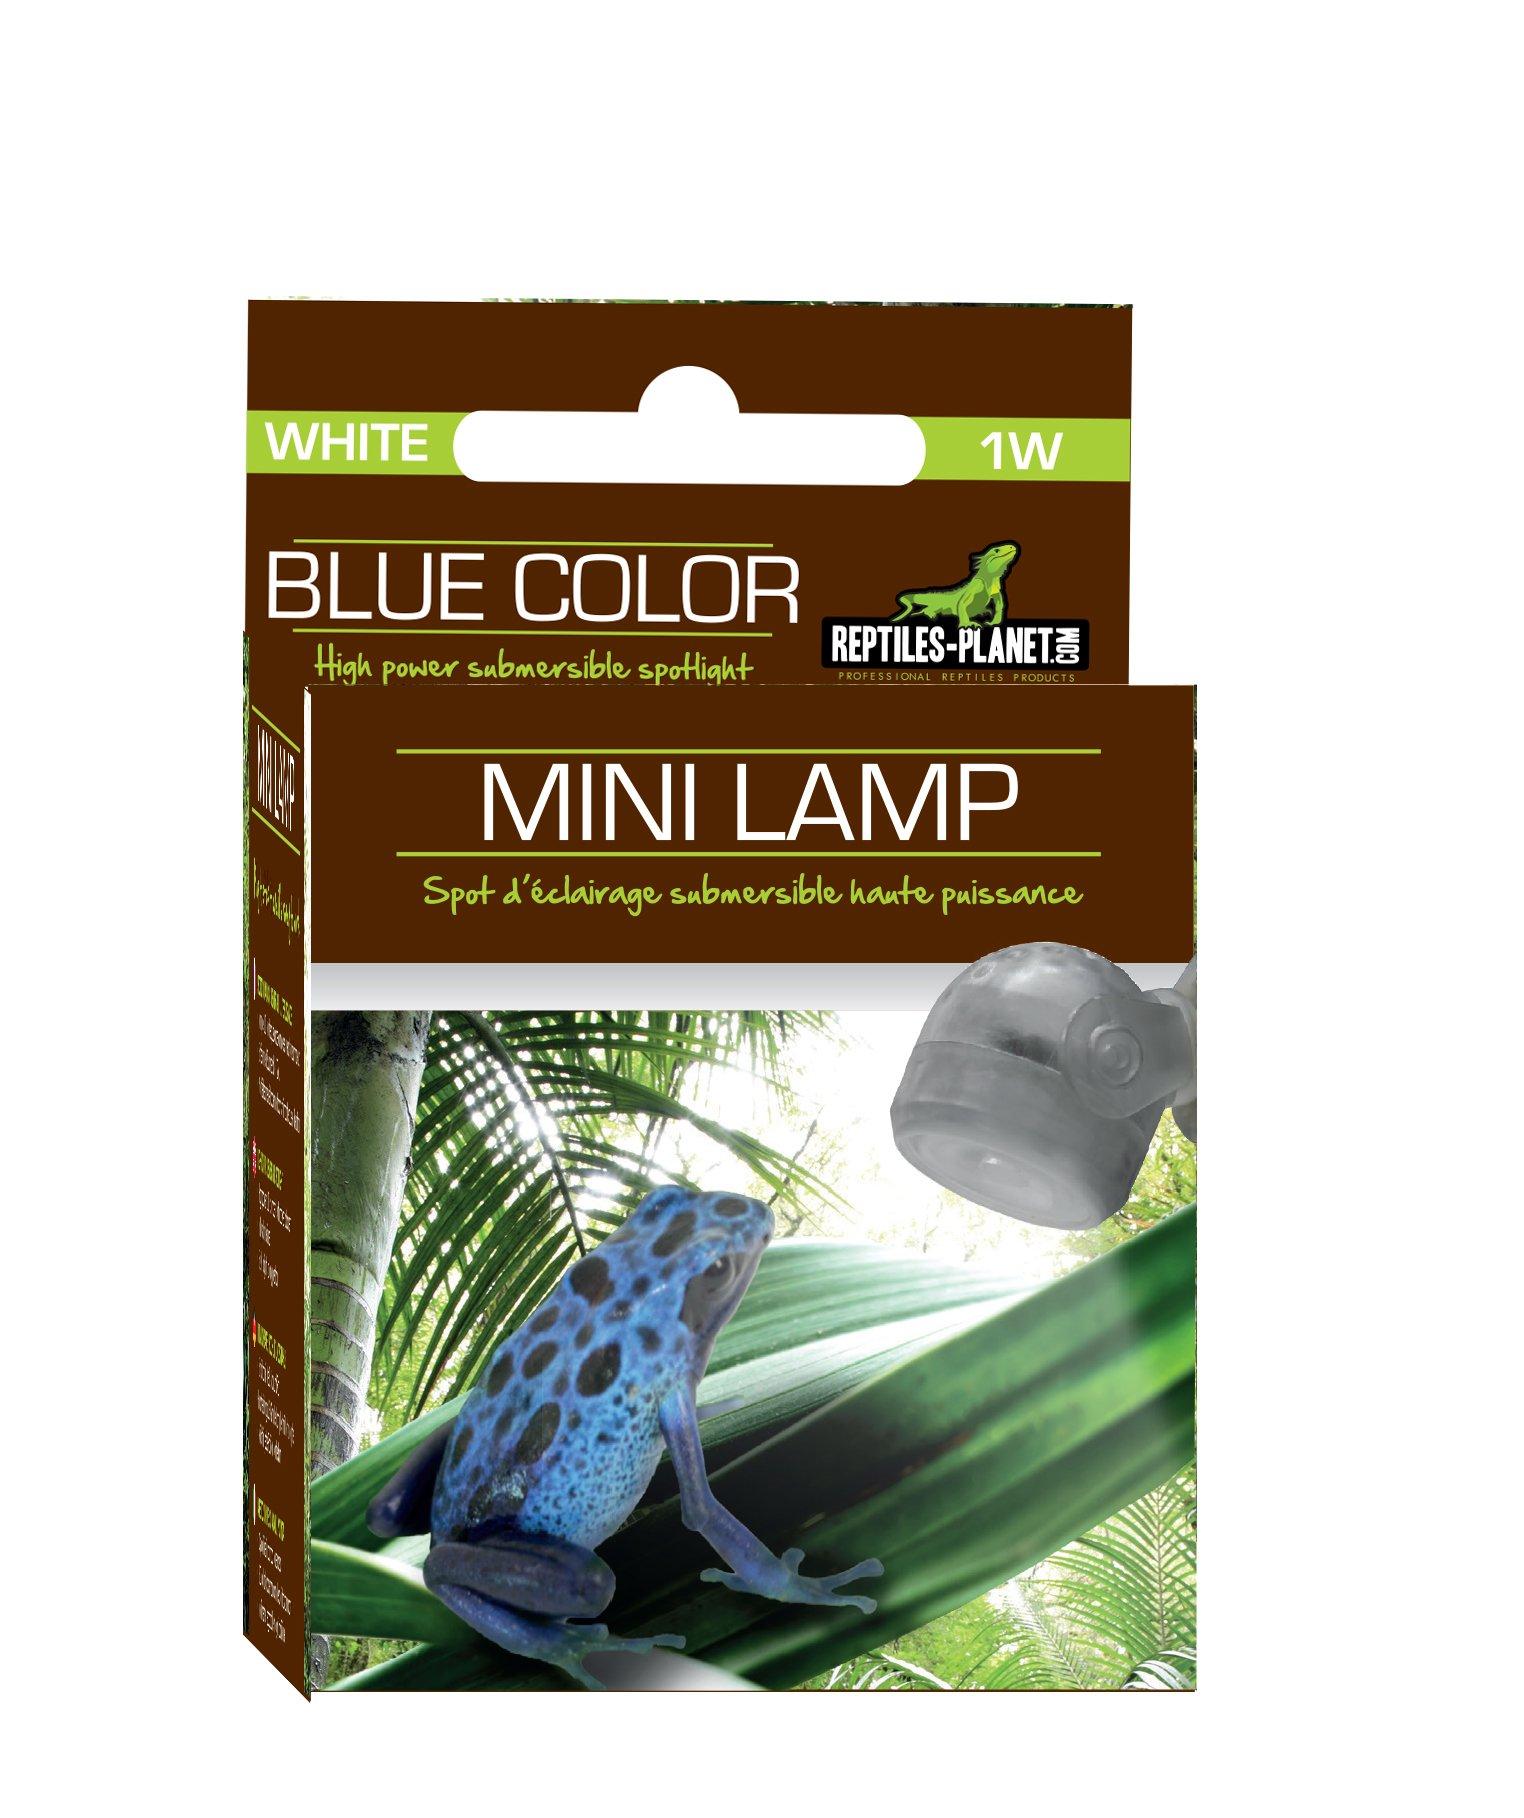 Reptiles Planet iluminación Mini lámpara LED Blanca Serpiente o Anfibios: Amazon.es: Productos para mascotas